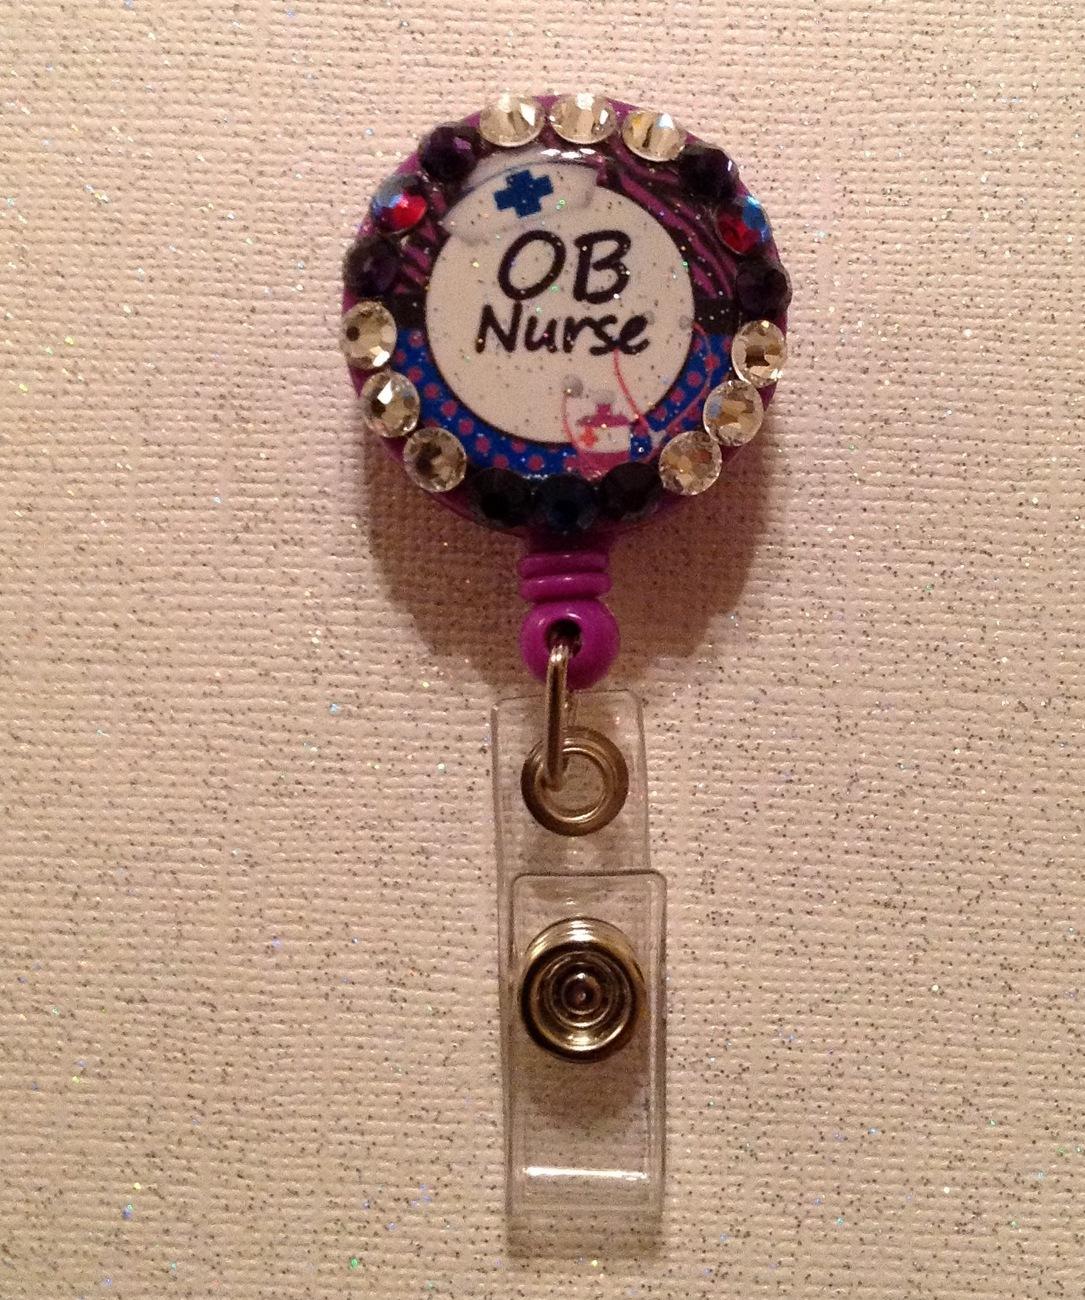 OB Nurse Badge Reel - OB Id Holder Lanyard - Swarovski Crystals Alligator Clip